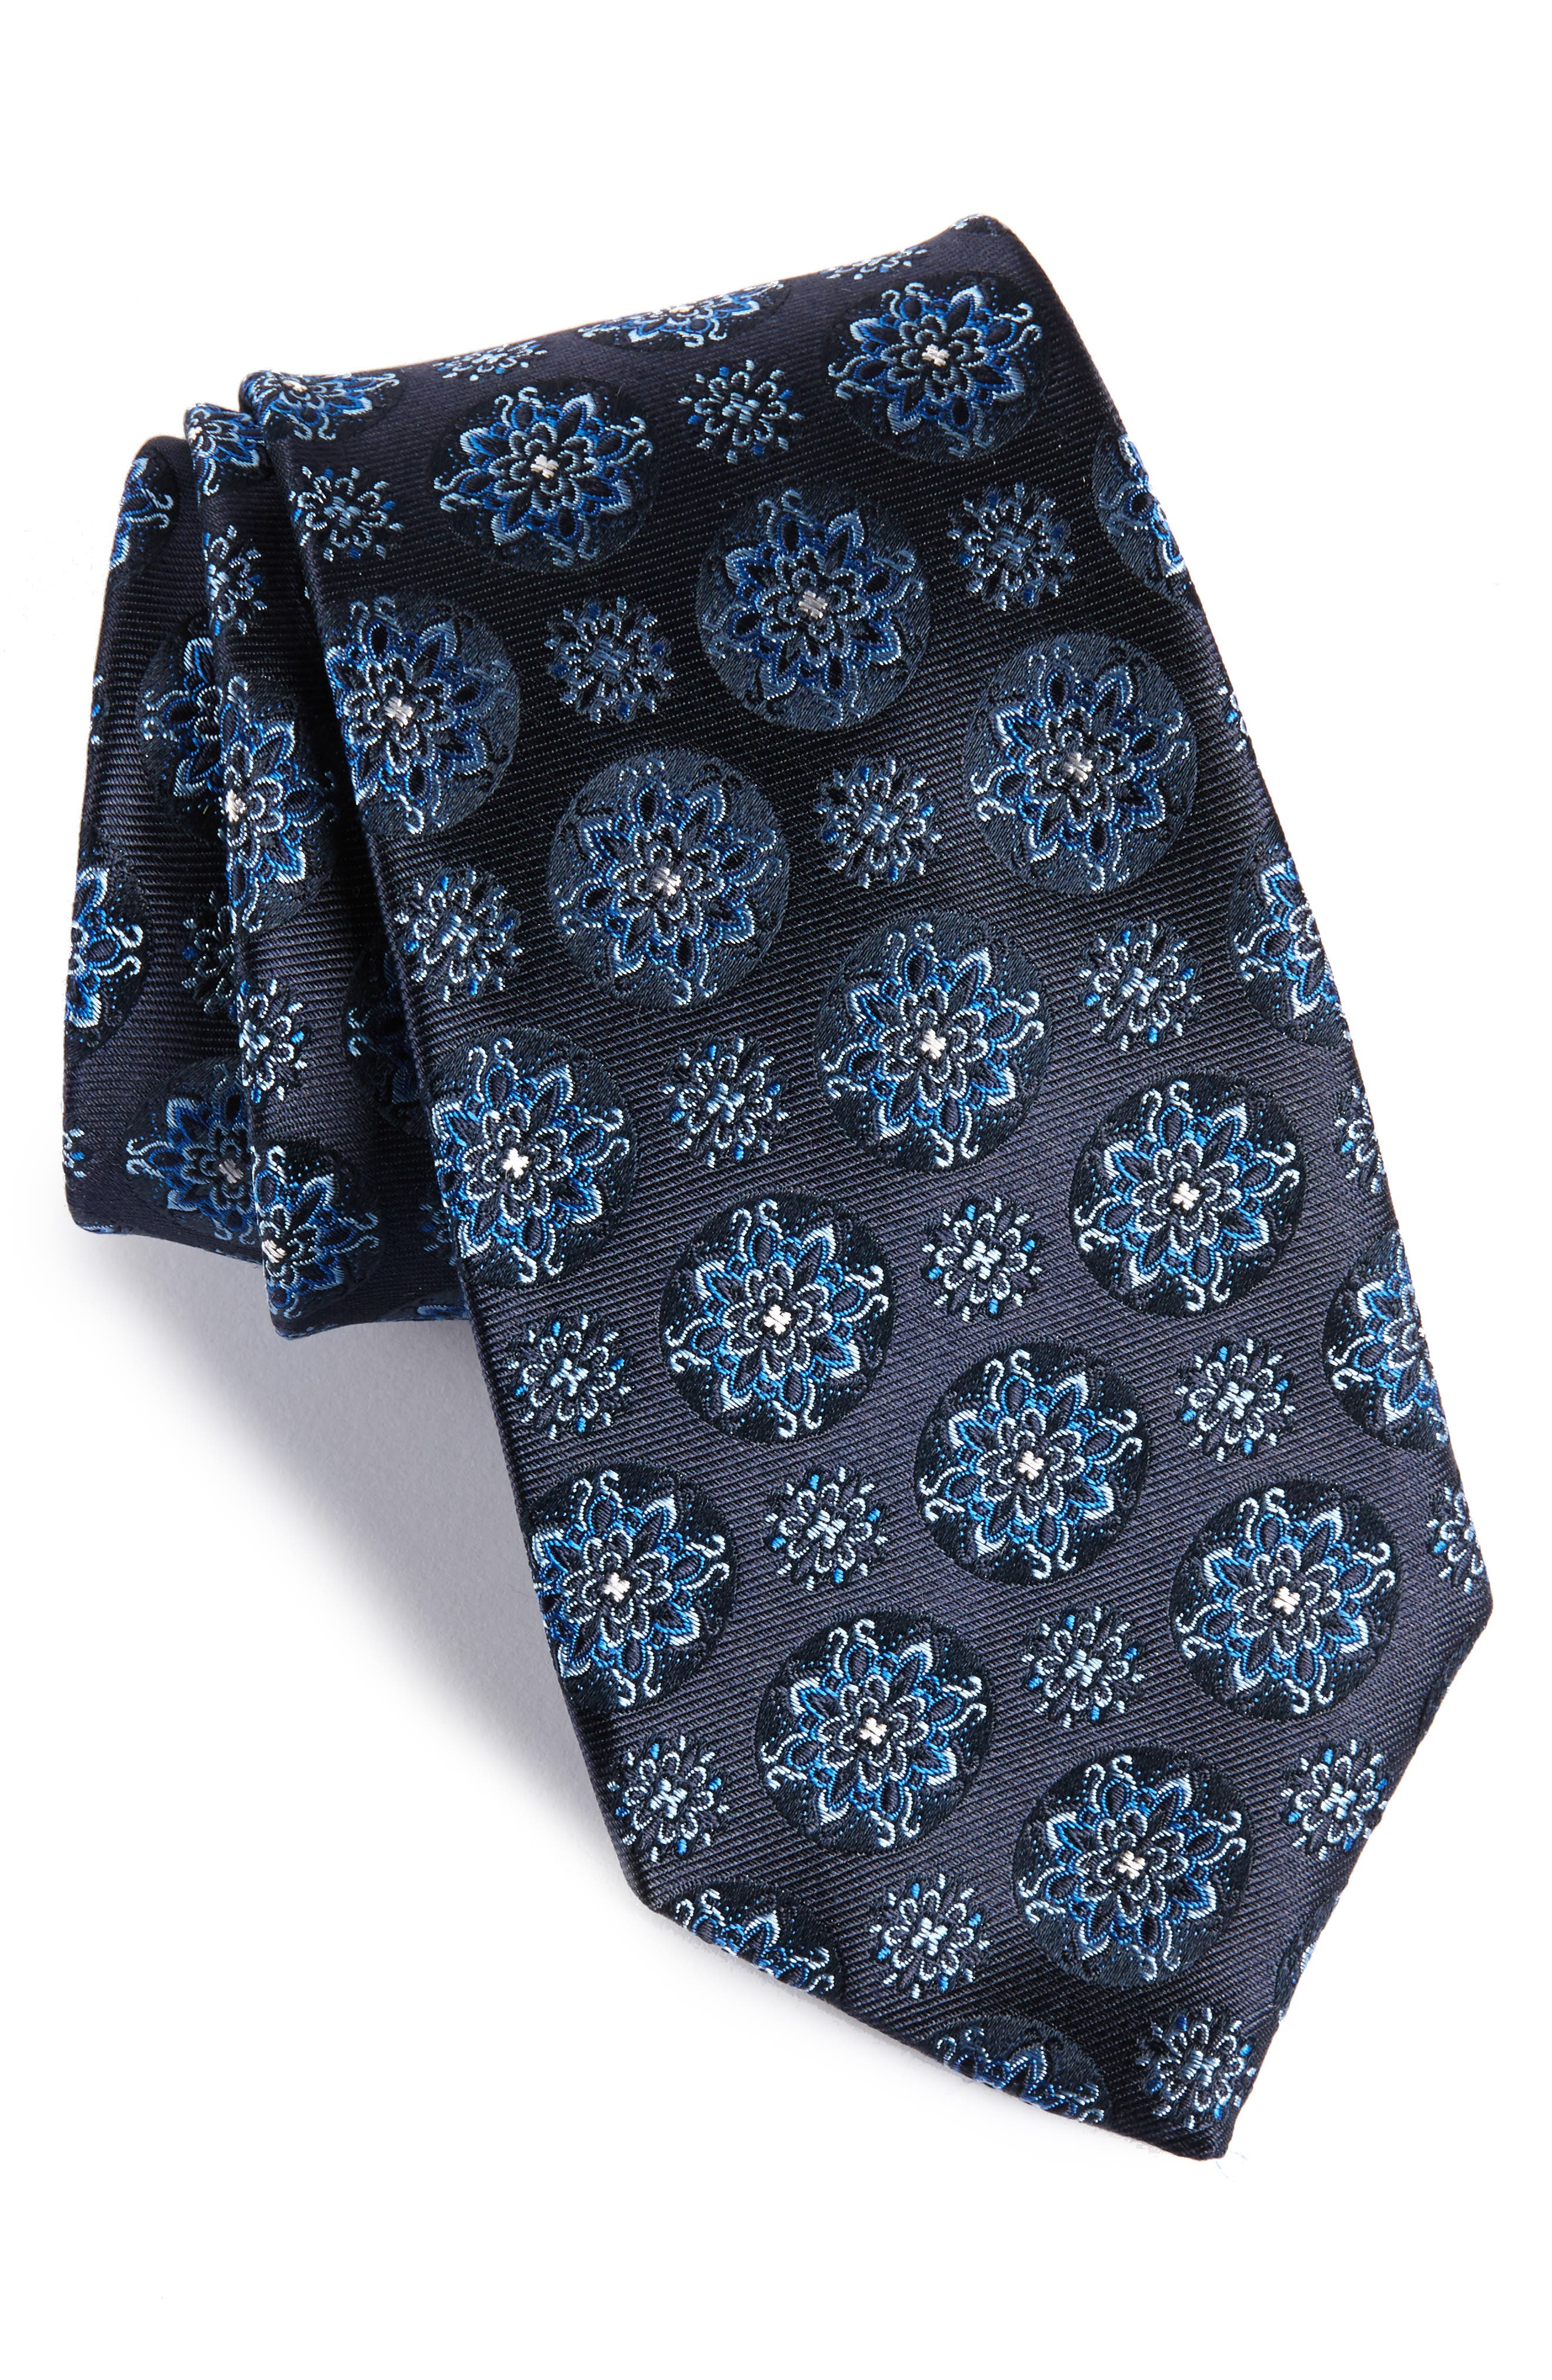 Main Image - BOSS Medallion Silk Tie